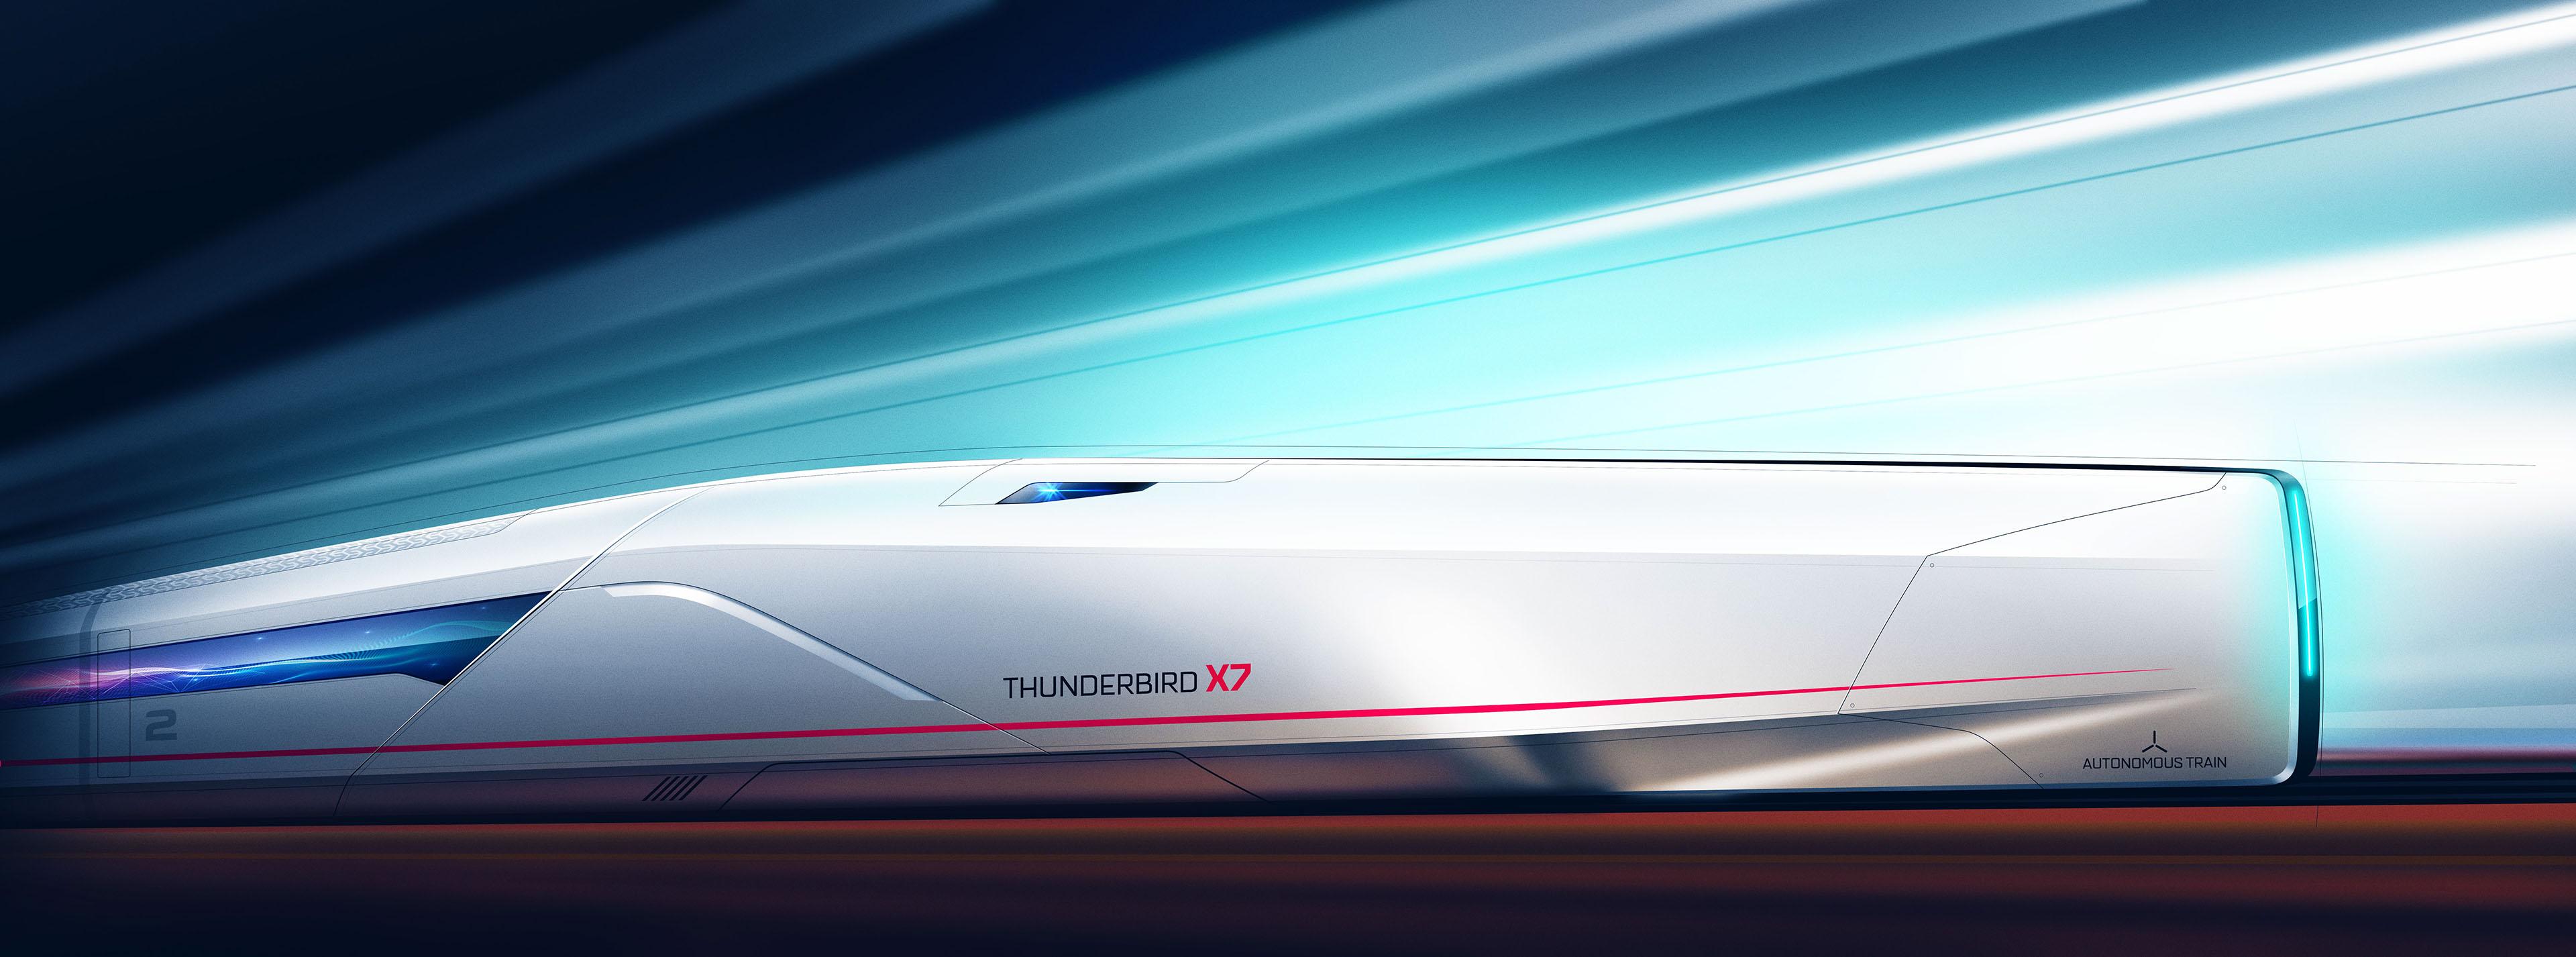 THUNDERBIRD X7 Autonomous train on